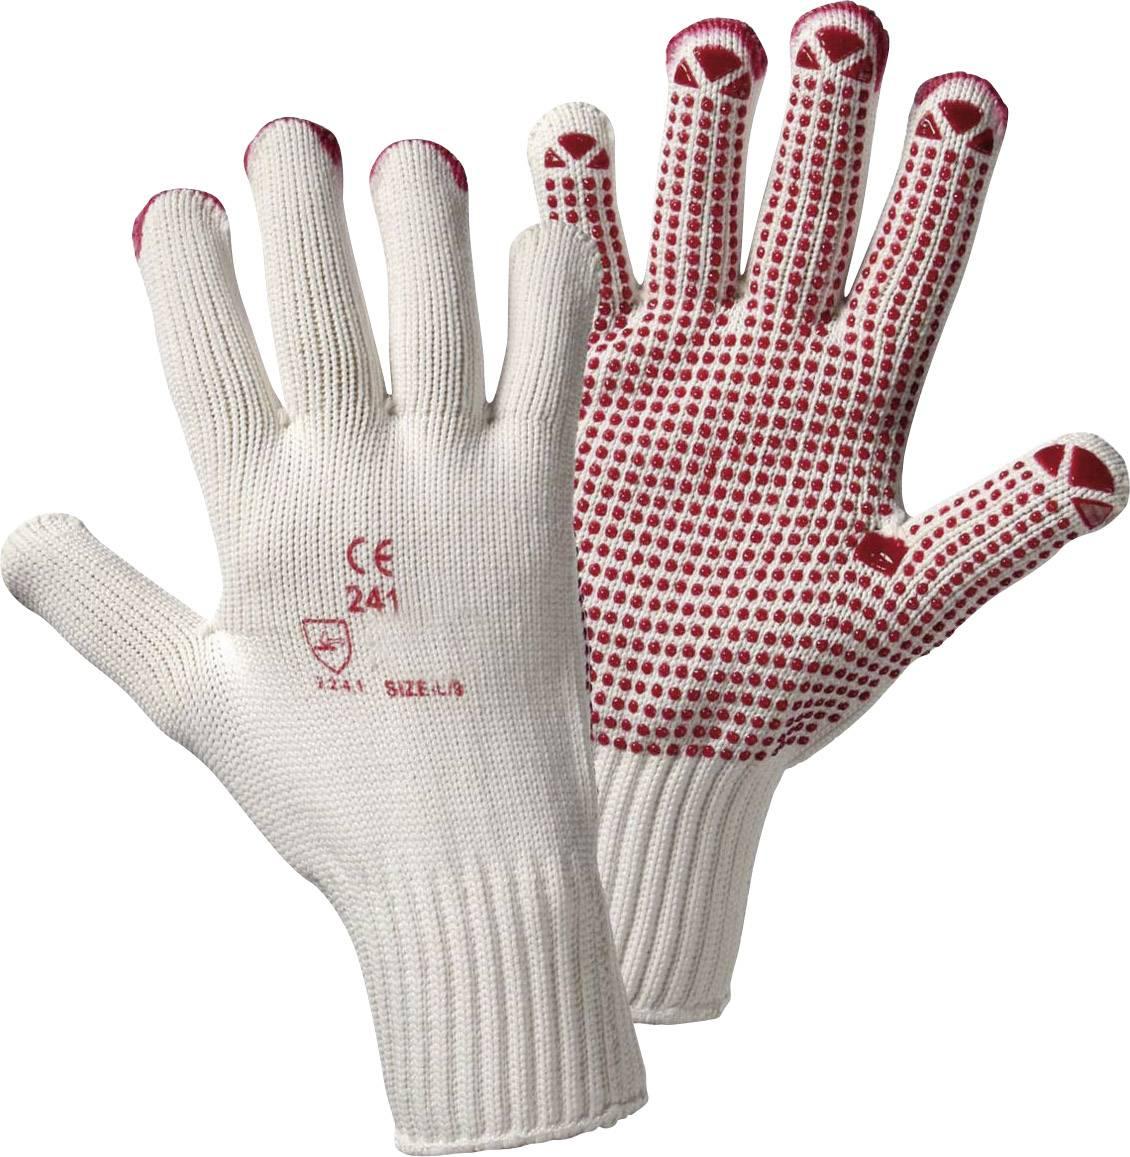 Worky Puncto 1130, velikost rukavic: 11.5, XXL